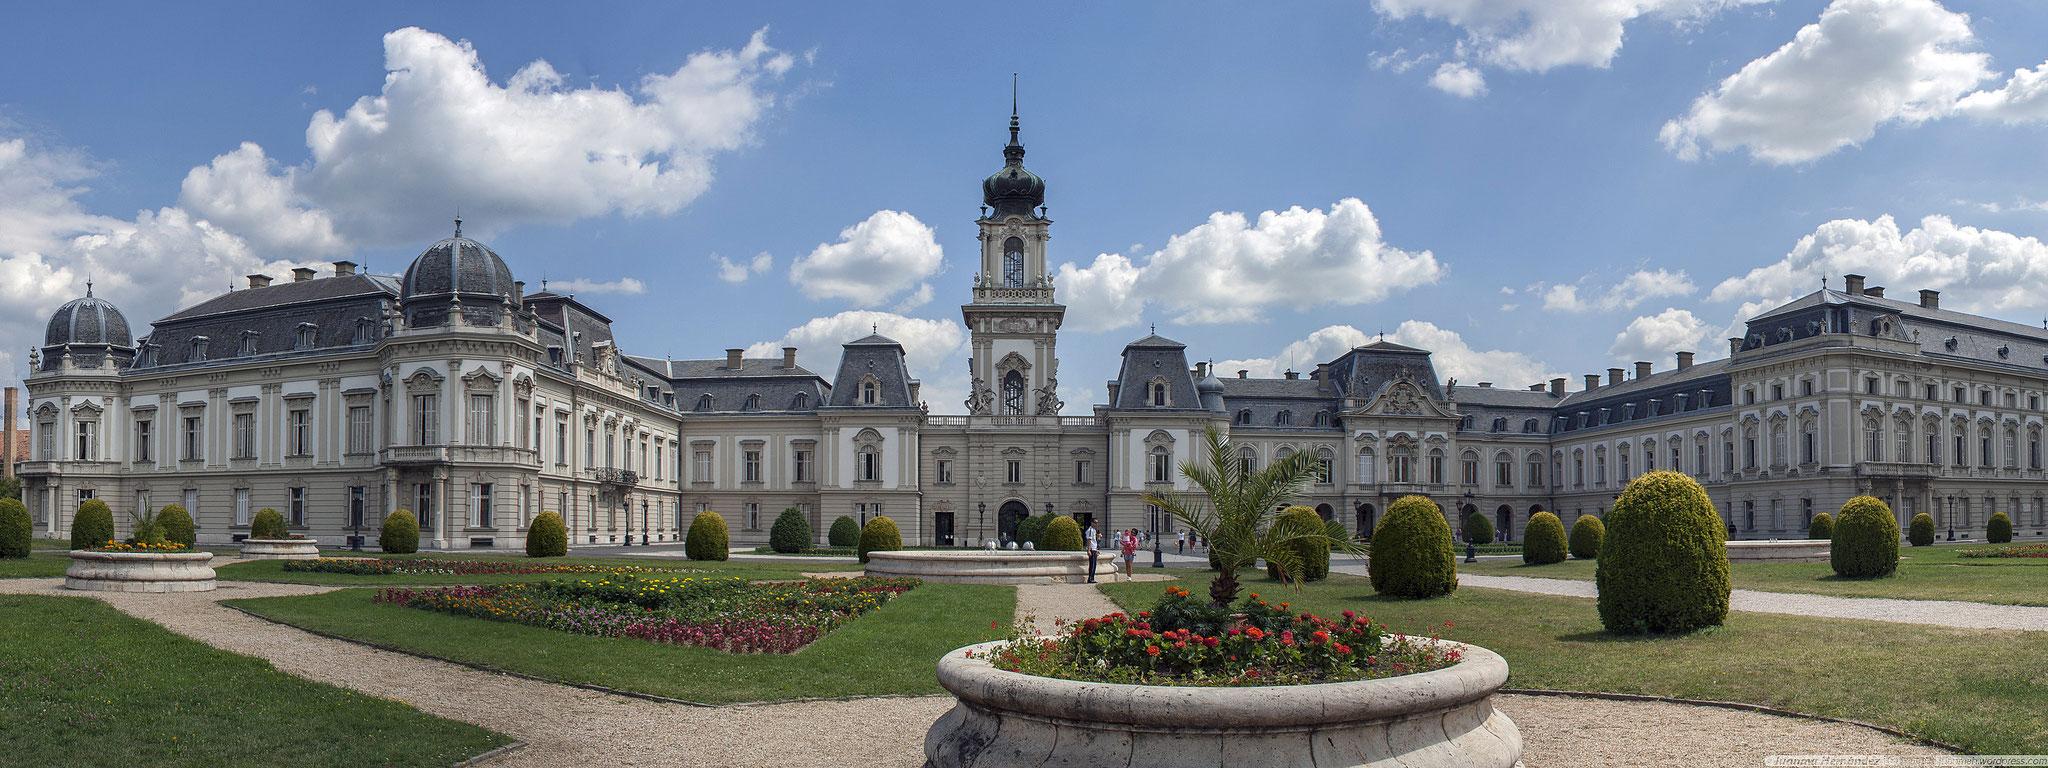 Het Festetics kasteel in Keszthely